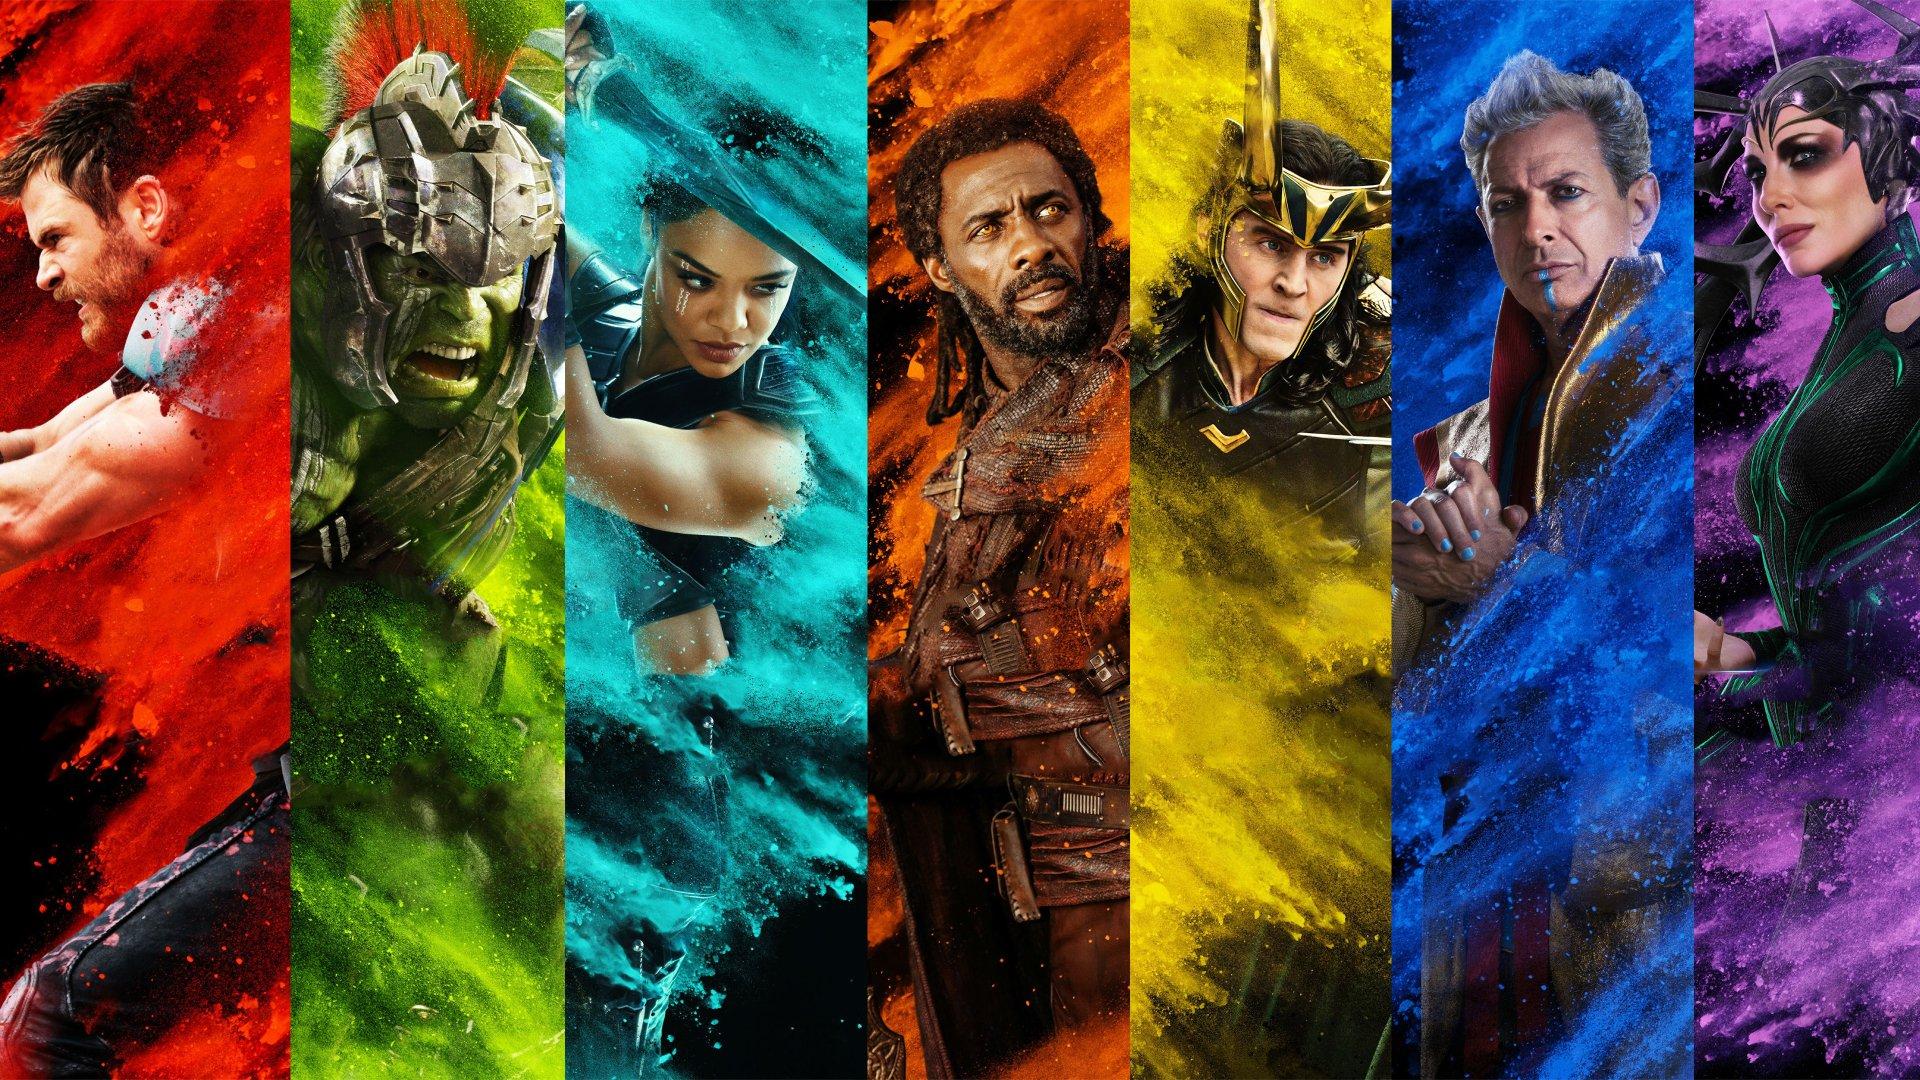 Movie - Thor: Ragnarok  Thor Hulk Chris Hemsworth Tom Hiddleston Loki Cate Blanchett Idris Elba Wallpaper